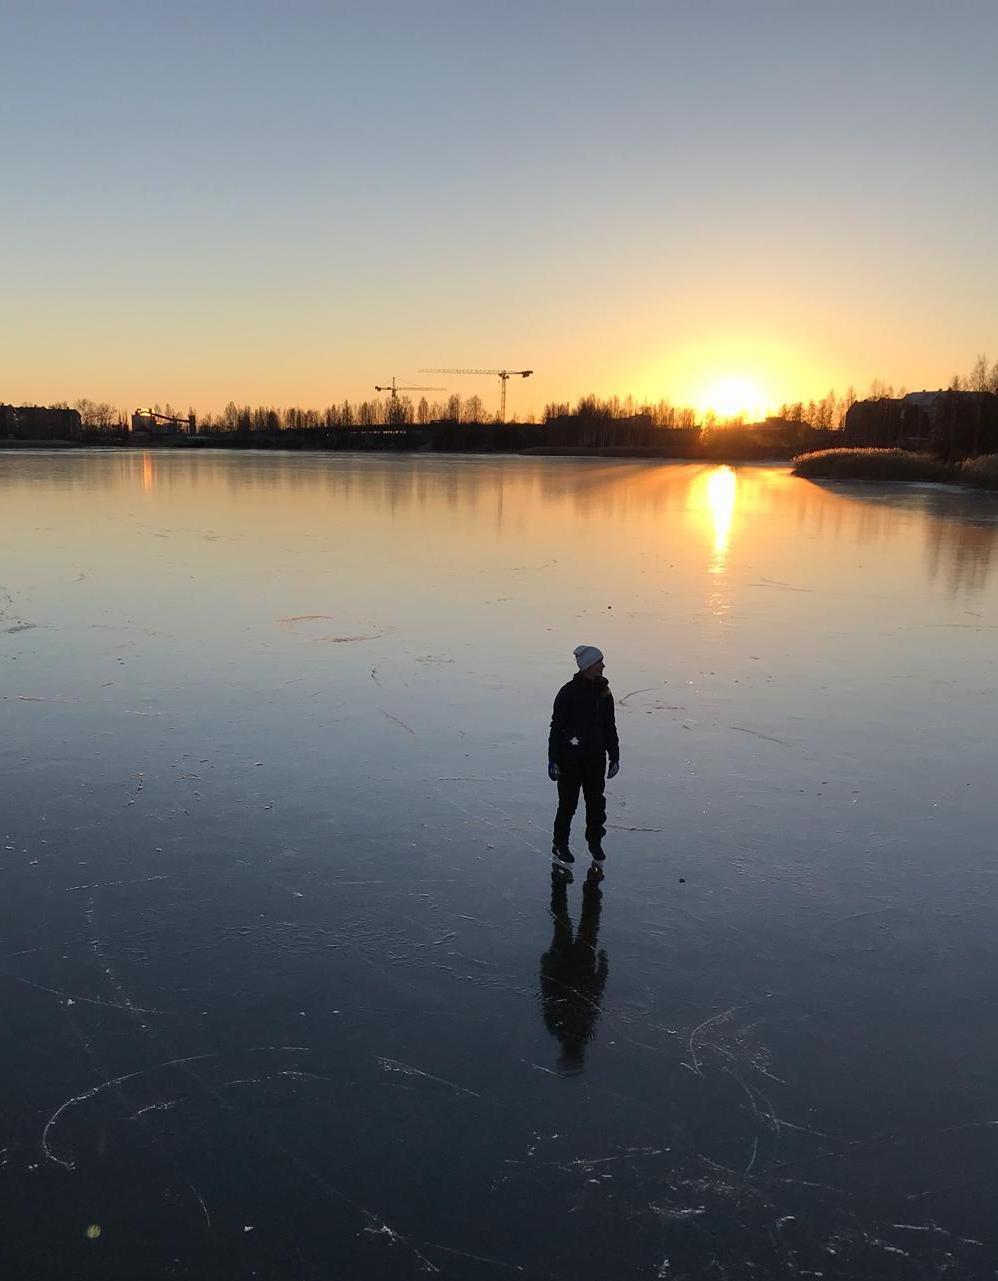 Smoot black ice. A person skating.